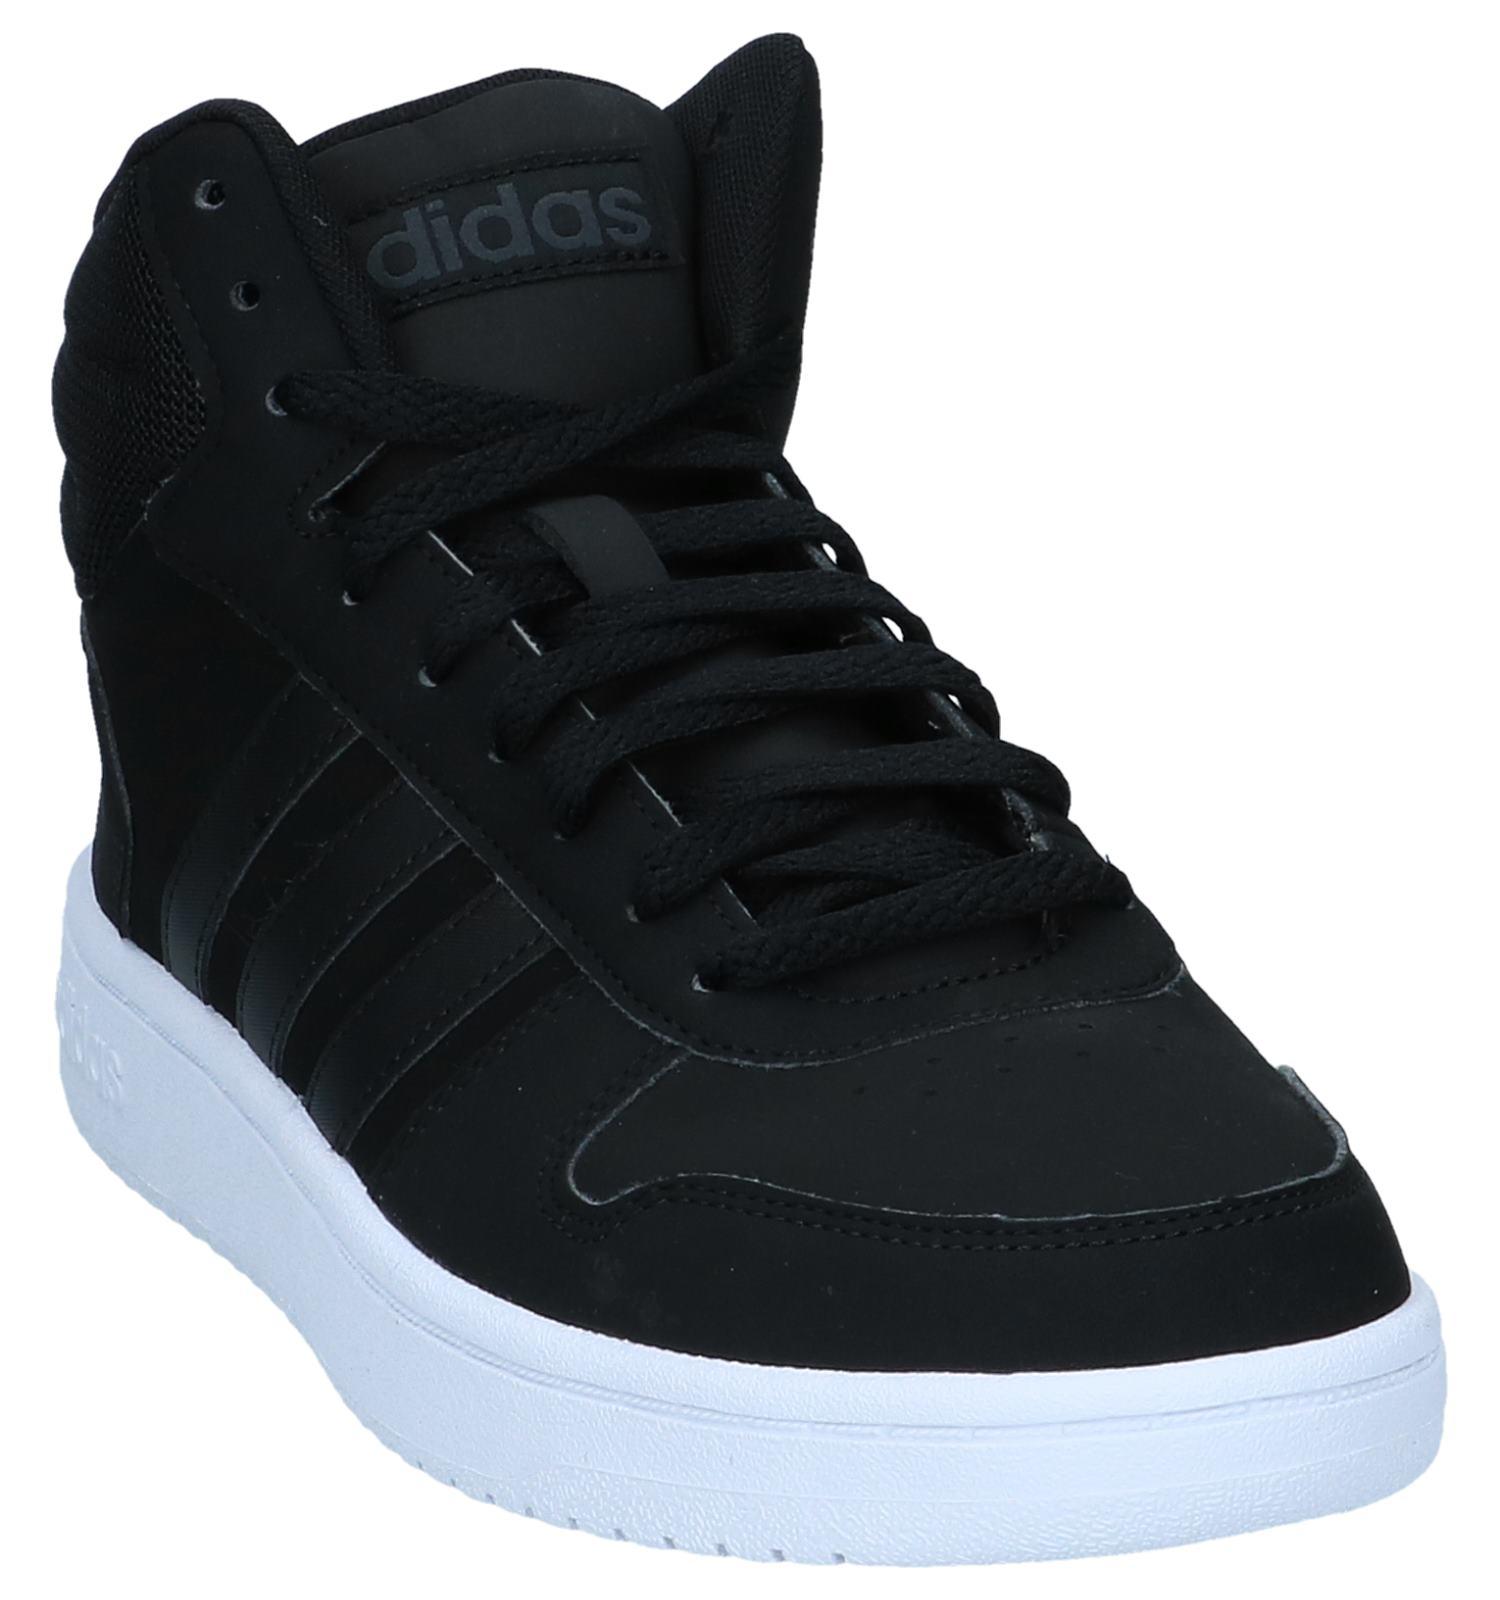 Hoge Sneakers adidas Hoops 2.0 Mid | SCHOENENTORFS.NL